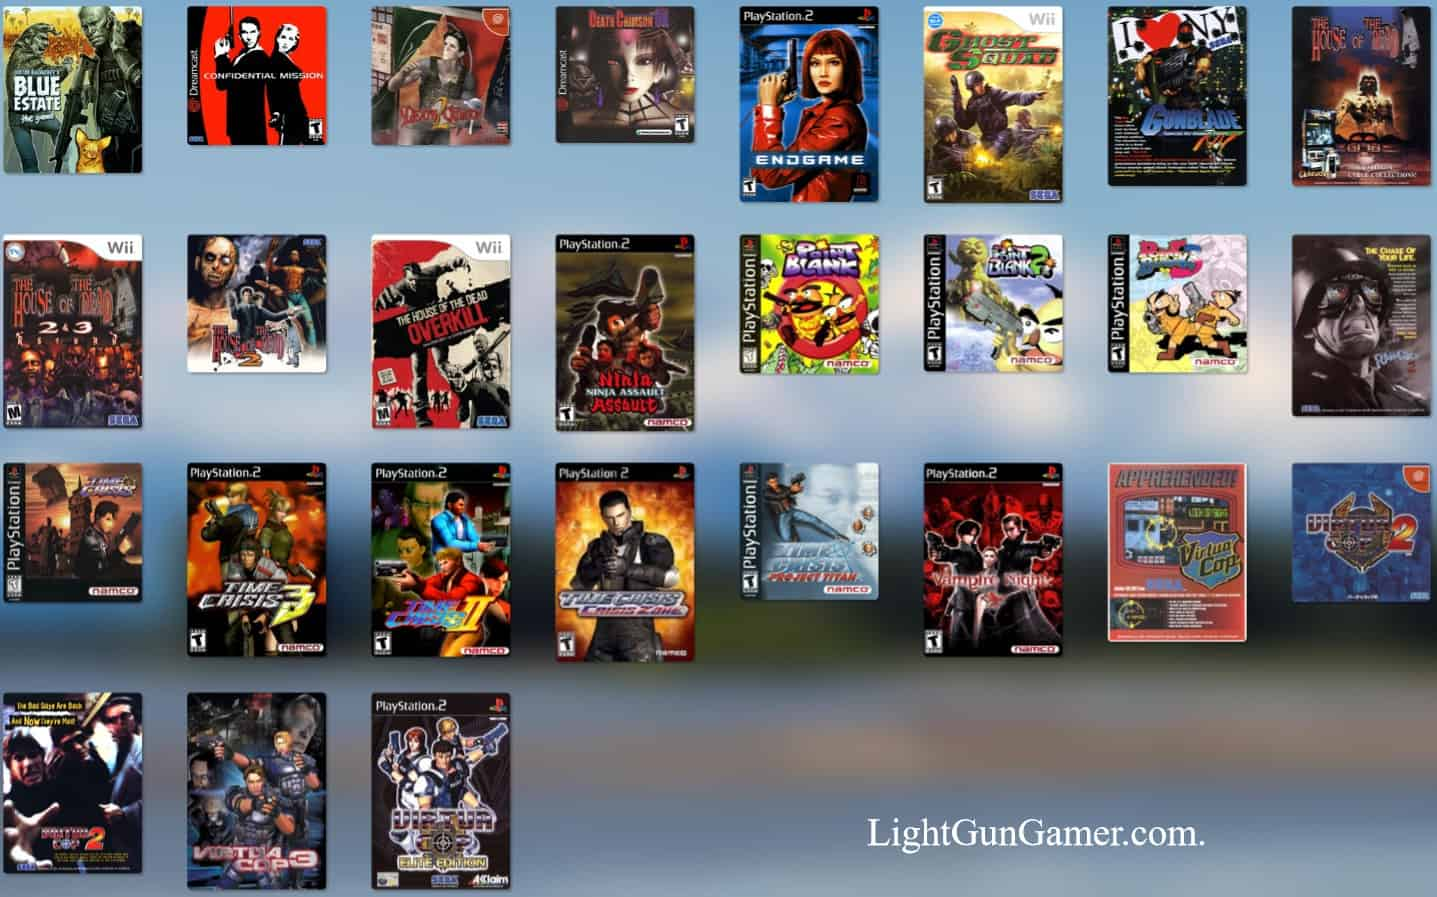 Light Gun Games on the PC